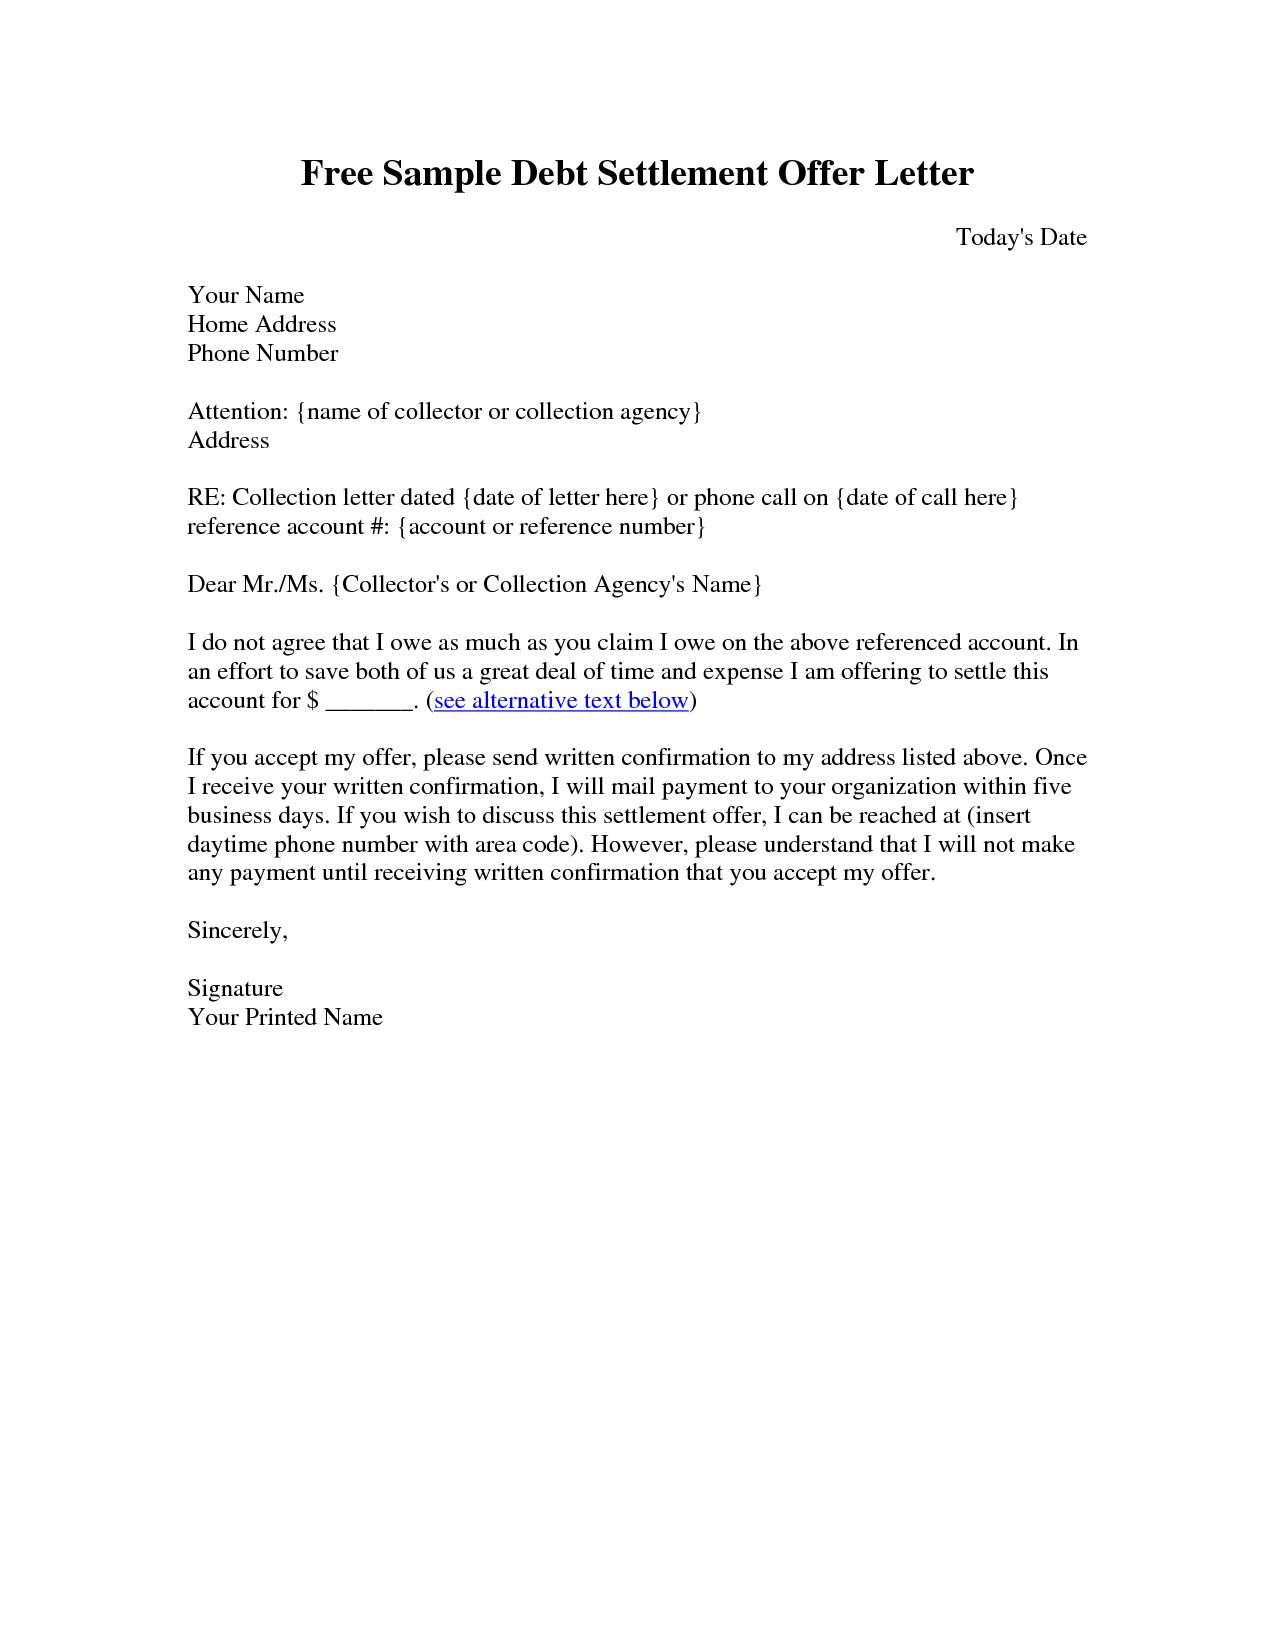 I Owe You Letter Template - Sample Settlement Letter Debt Settlement Letter Sample